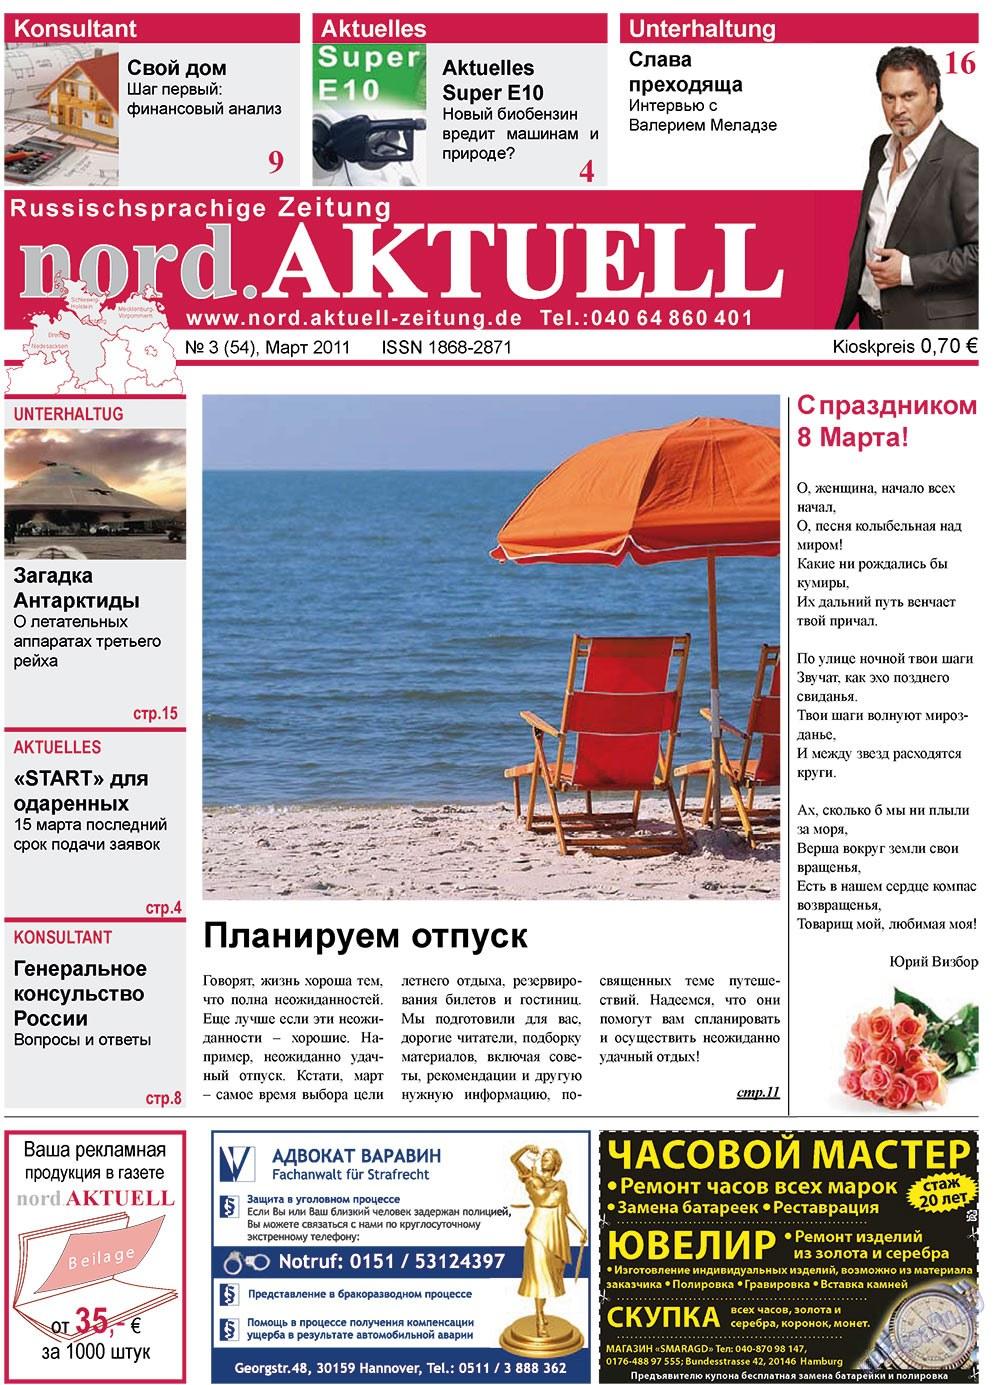 nord.Aktuell (газета). 2011 год, номер 3, стр. 1